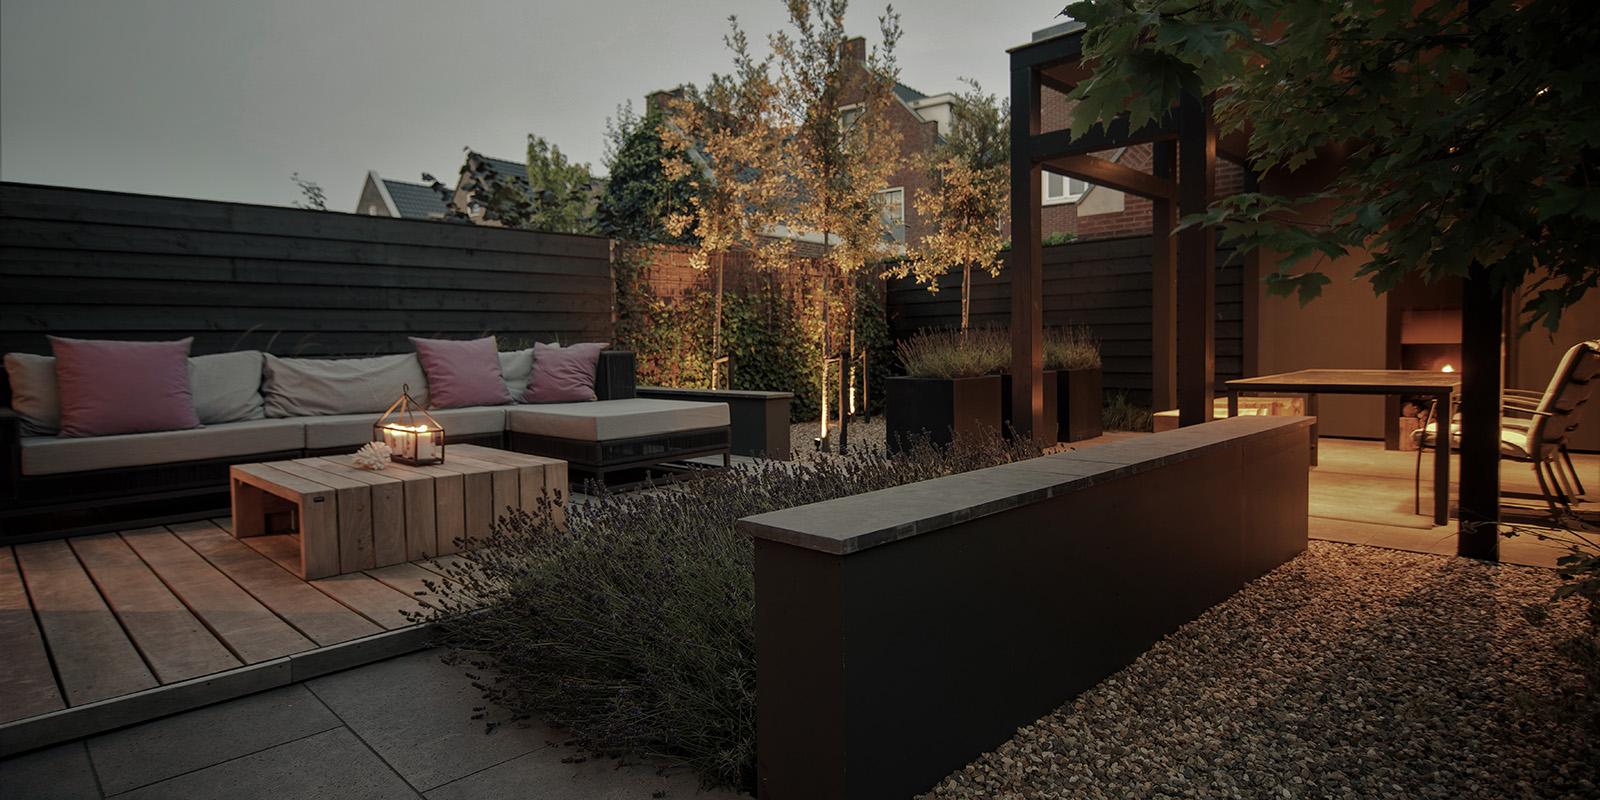 tuin met veranda, Buytengewoon Tuinontwerp, The Art of Living